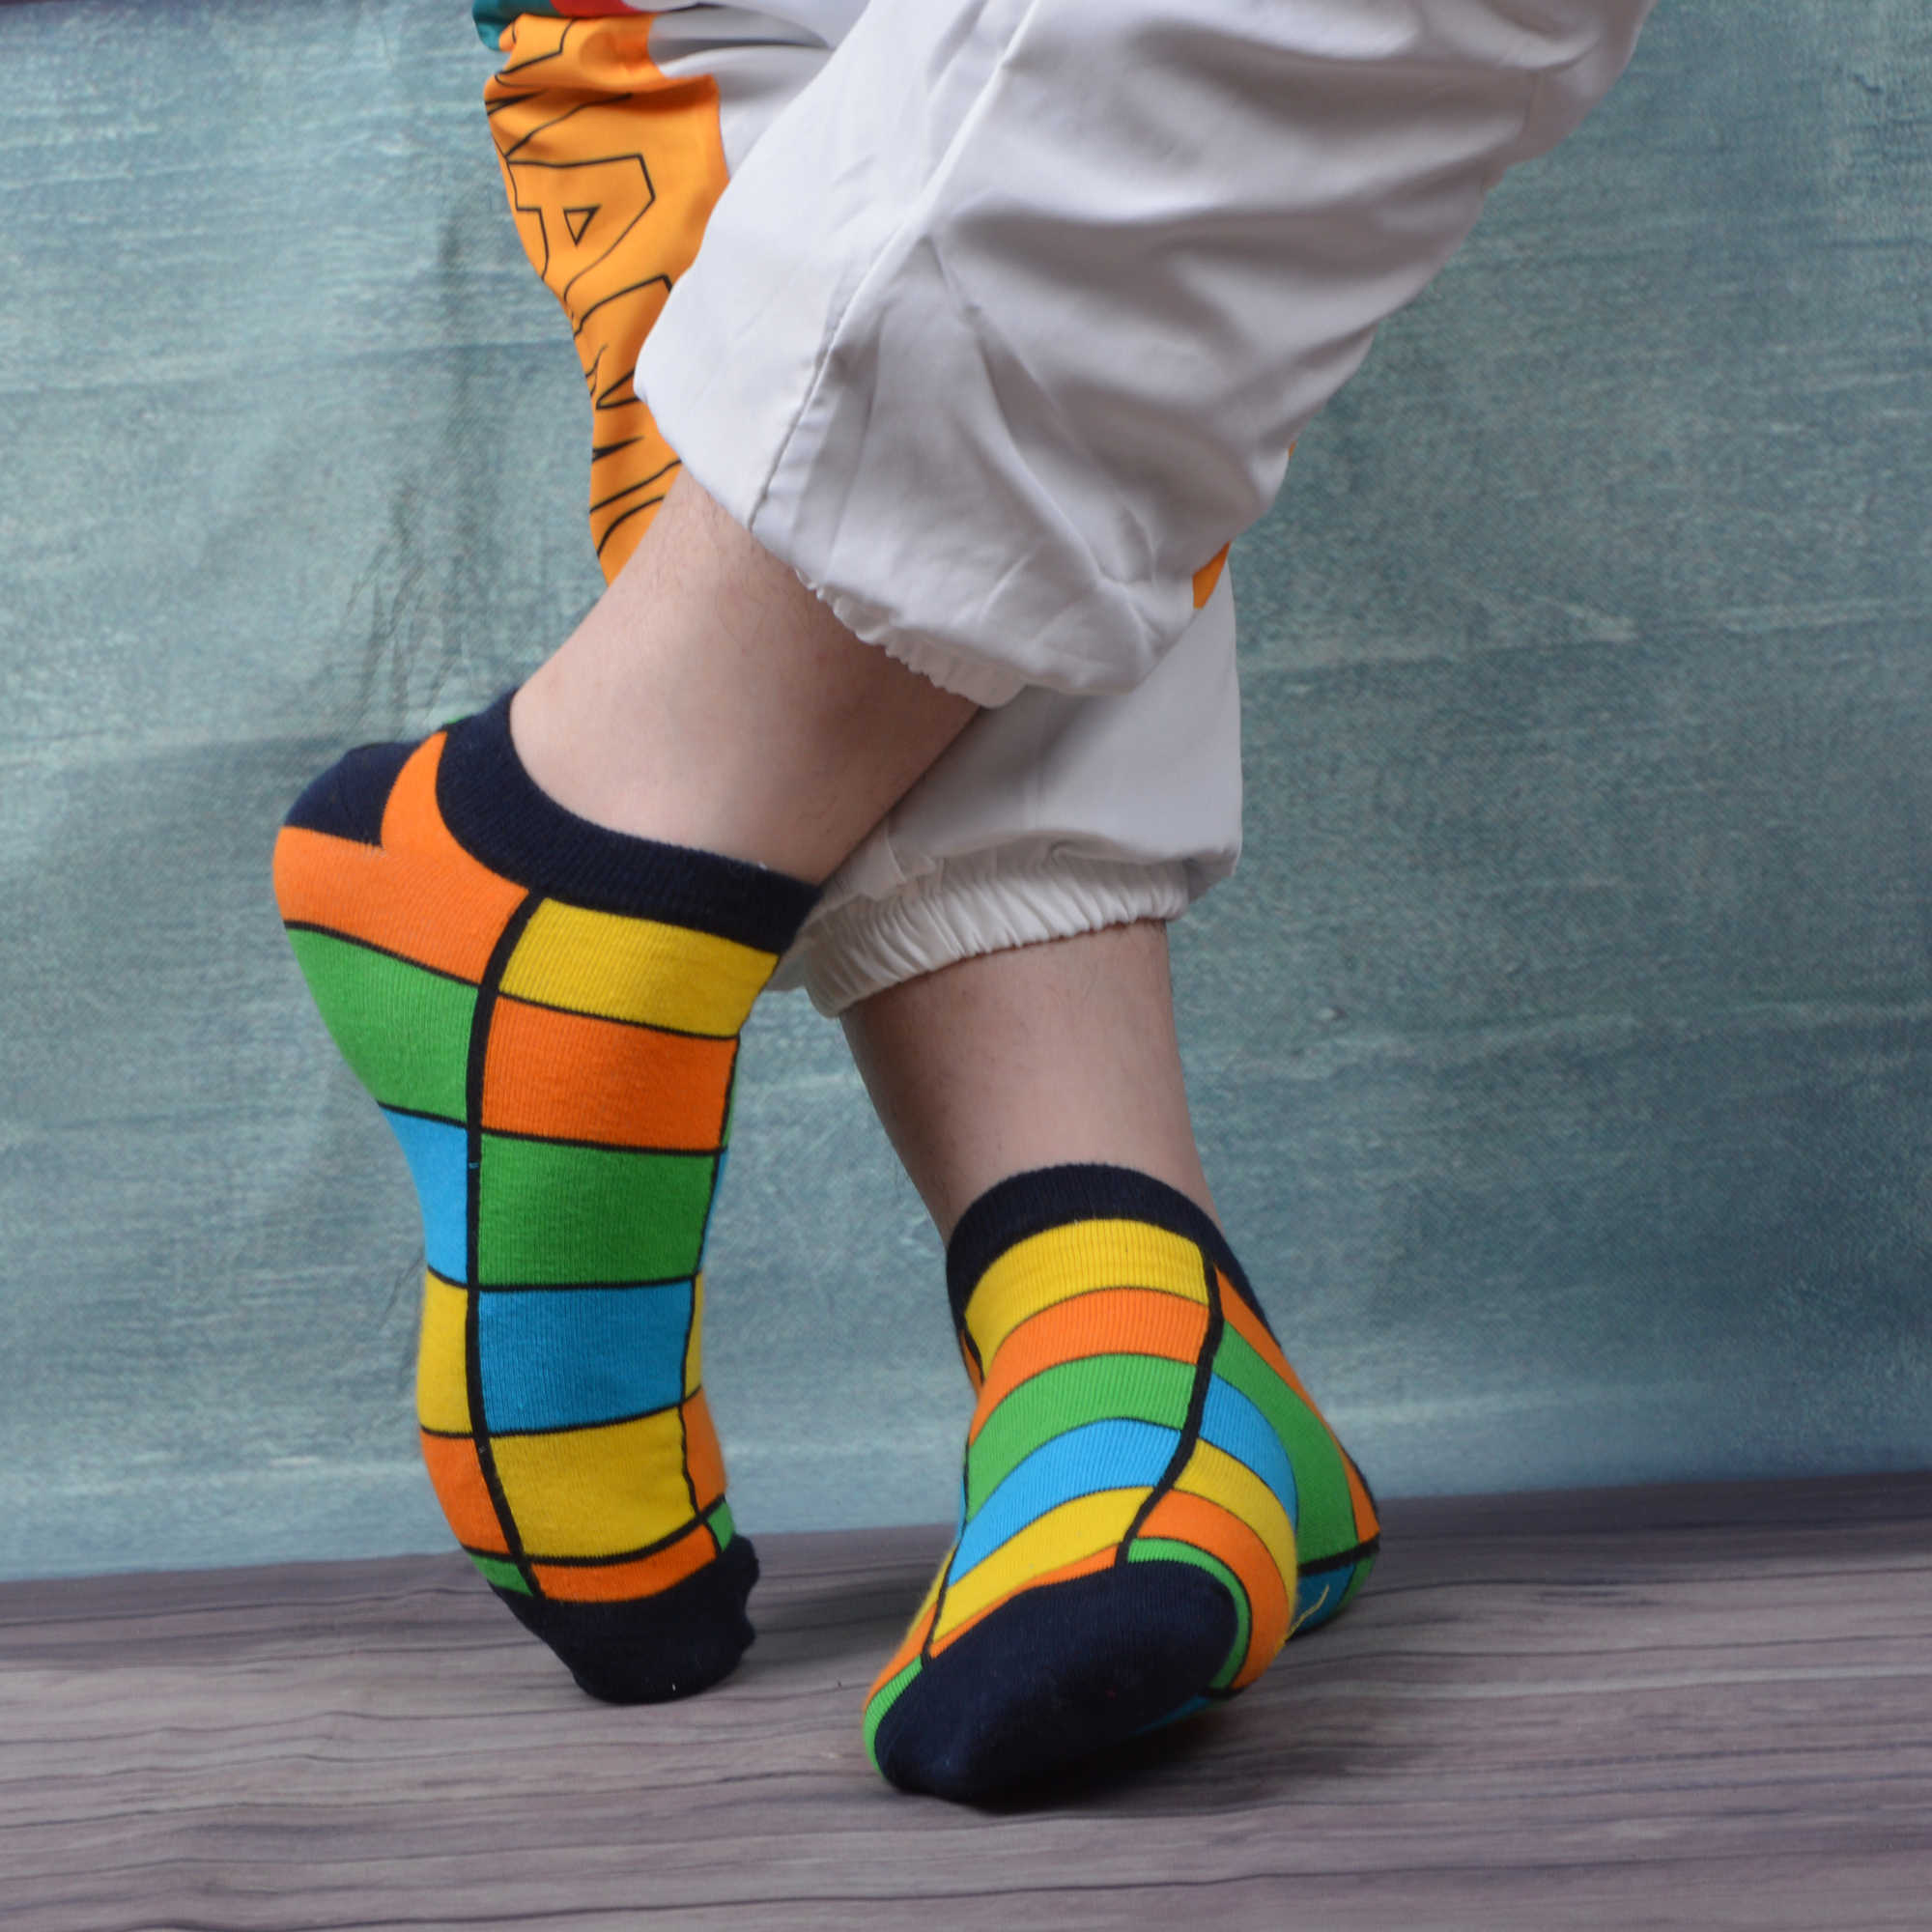 Chanwazibibiliu Tropical Fish Mens Colorful Dress Socks Funky Men Multicolored Pattern Fashionable Fun Crew Cotton Socks